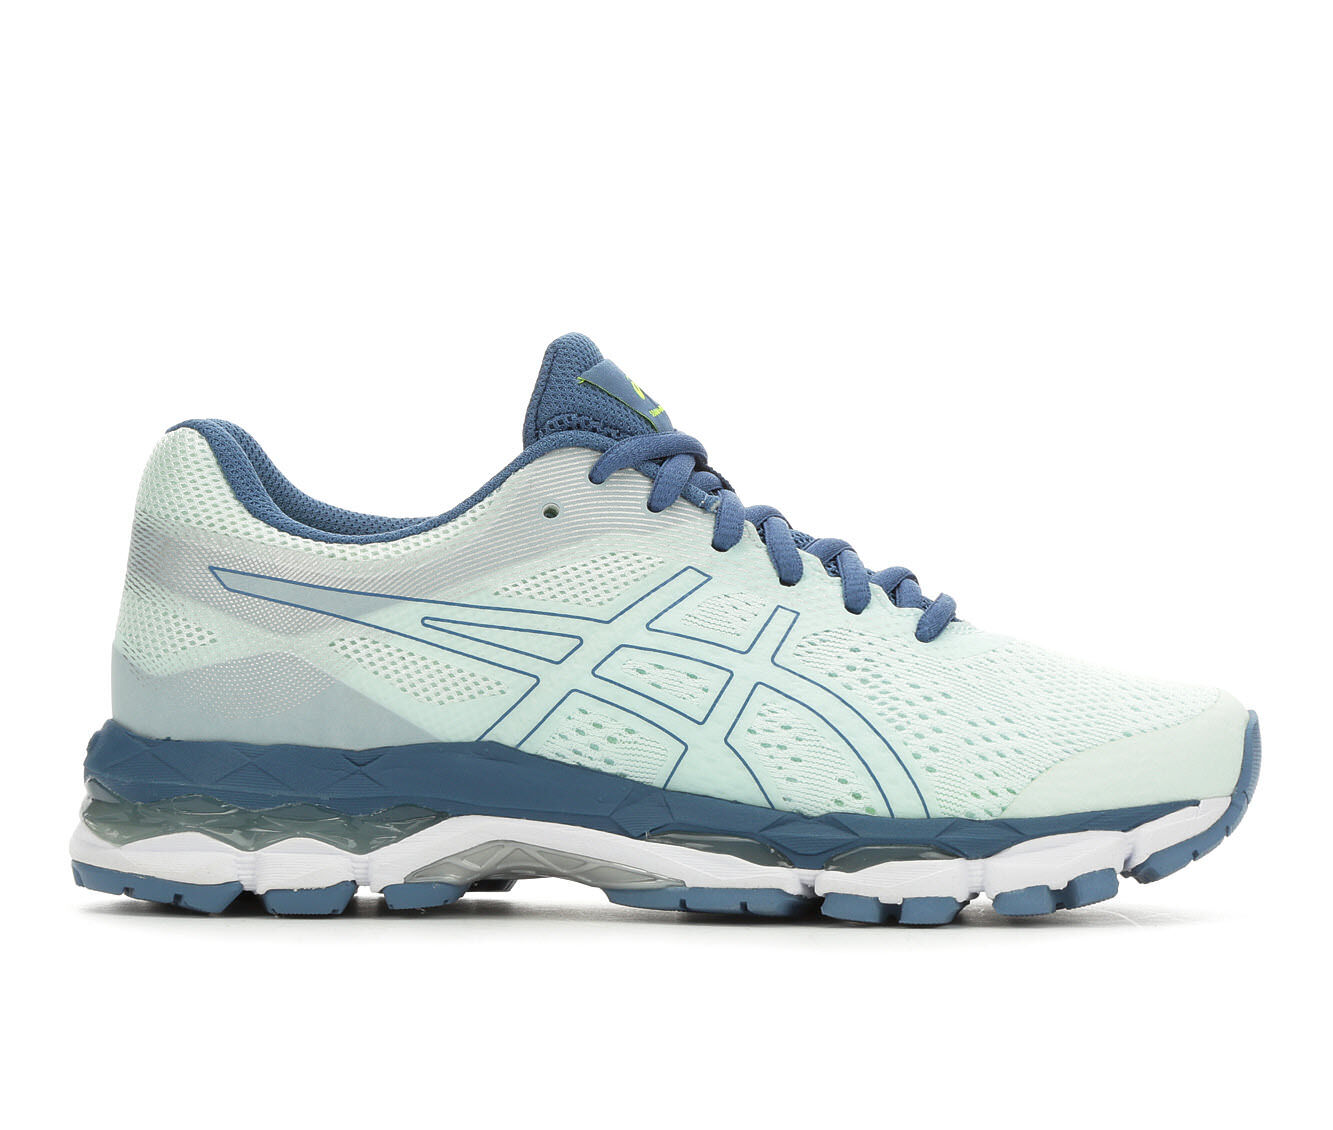 Women's ASICS Gel Superion 2 Running Shoes Sea/Azure